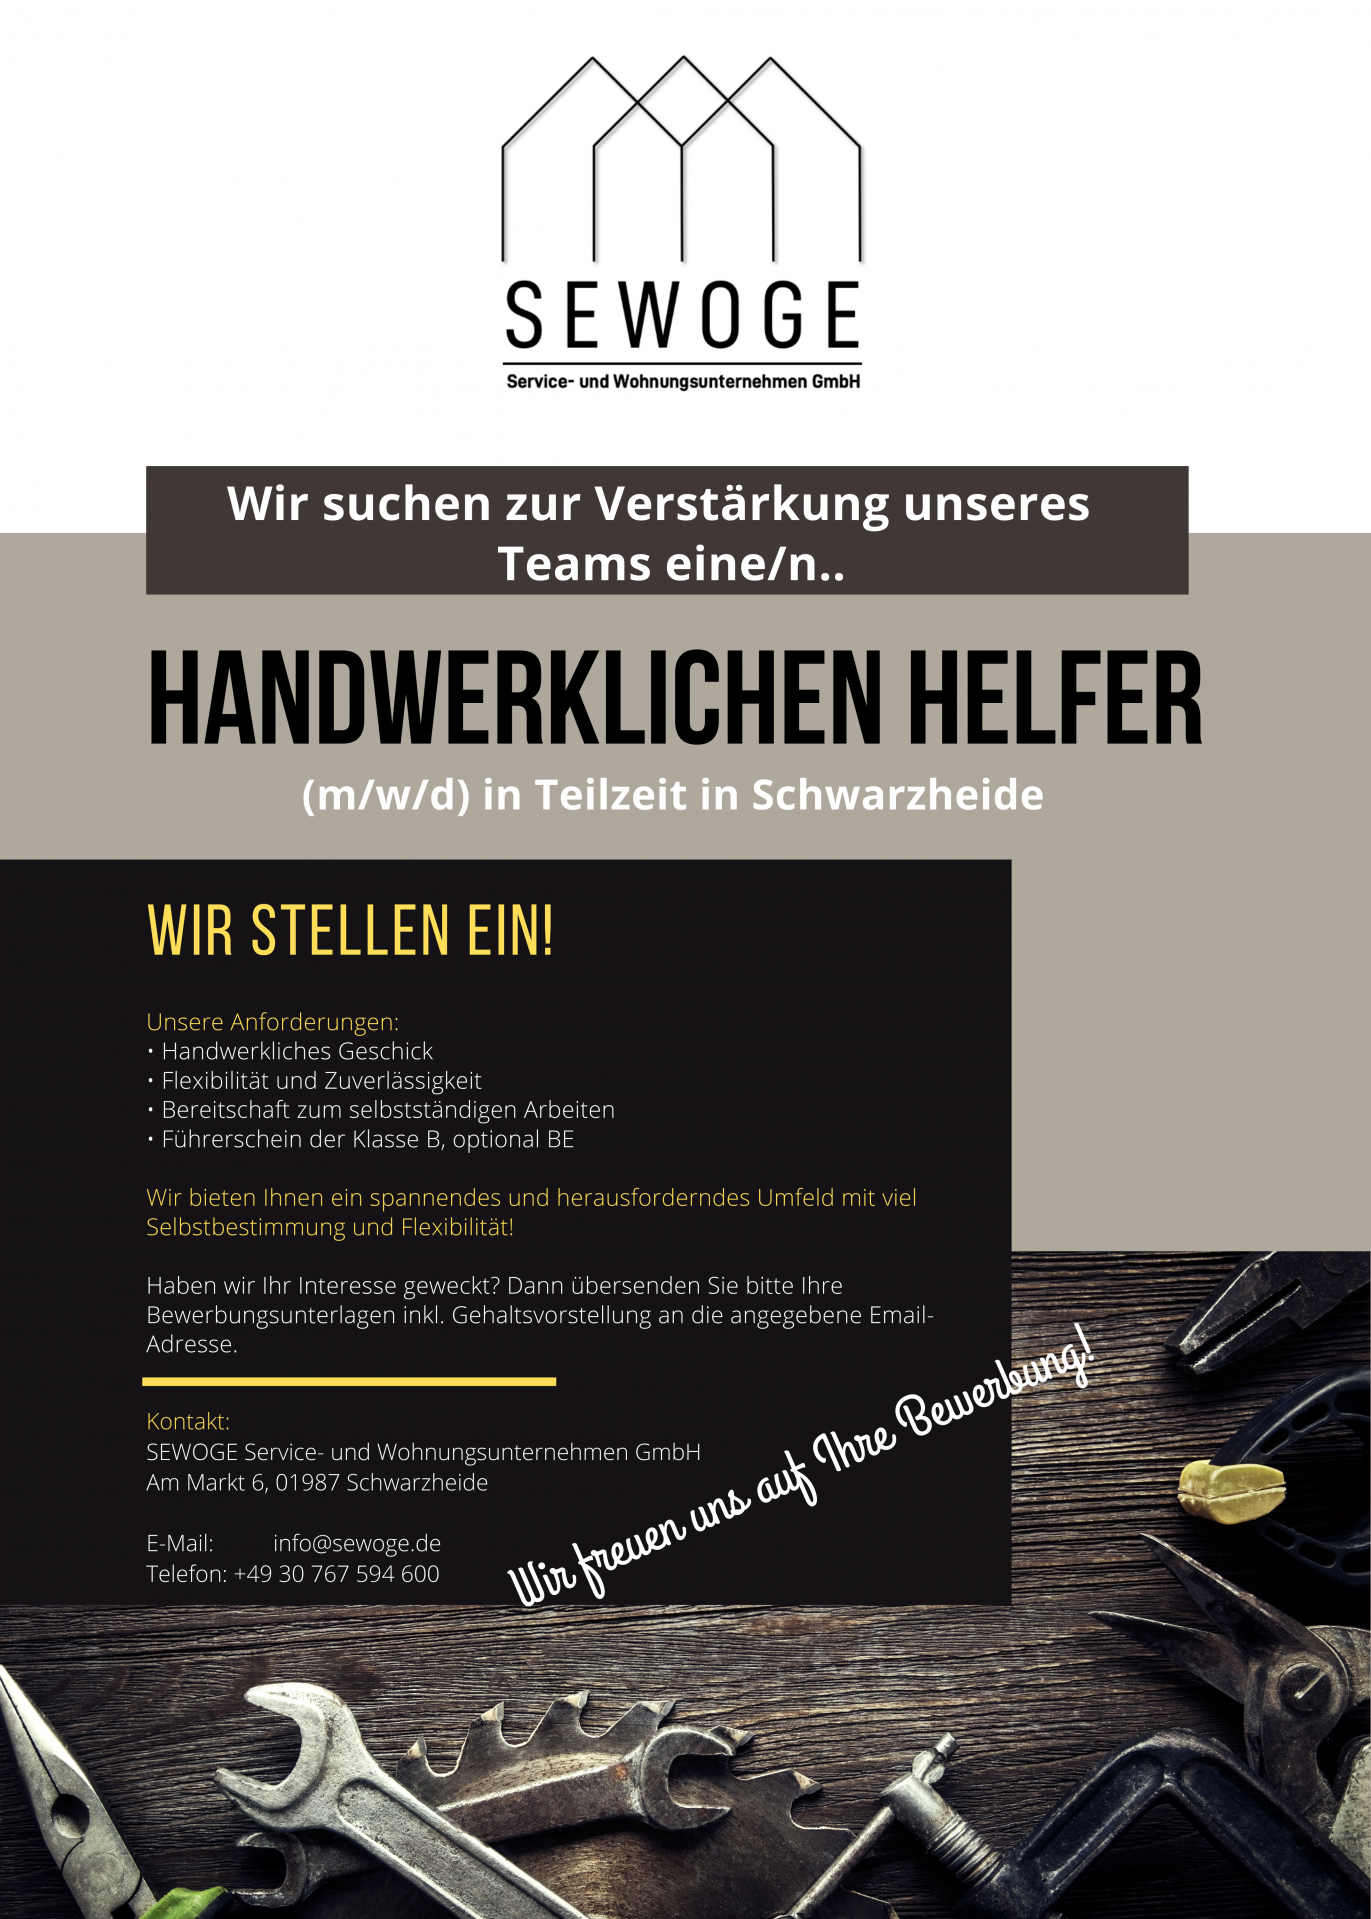 SEWOGE Helfer